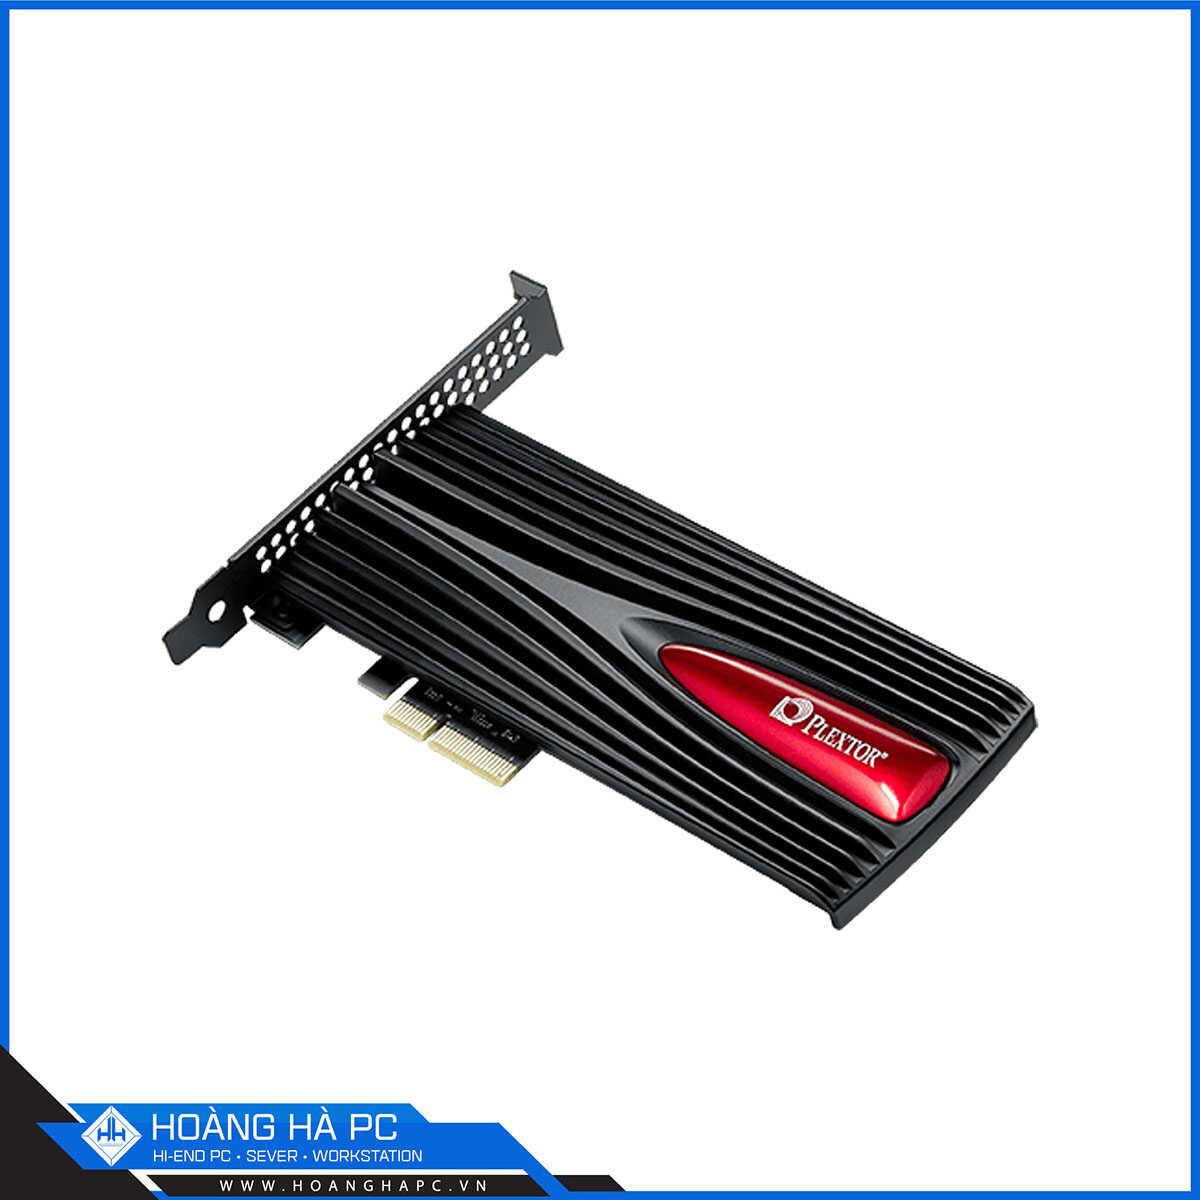 Ổ Cứng SSD Plextor PX-512M9PeY 512GB